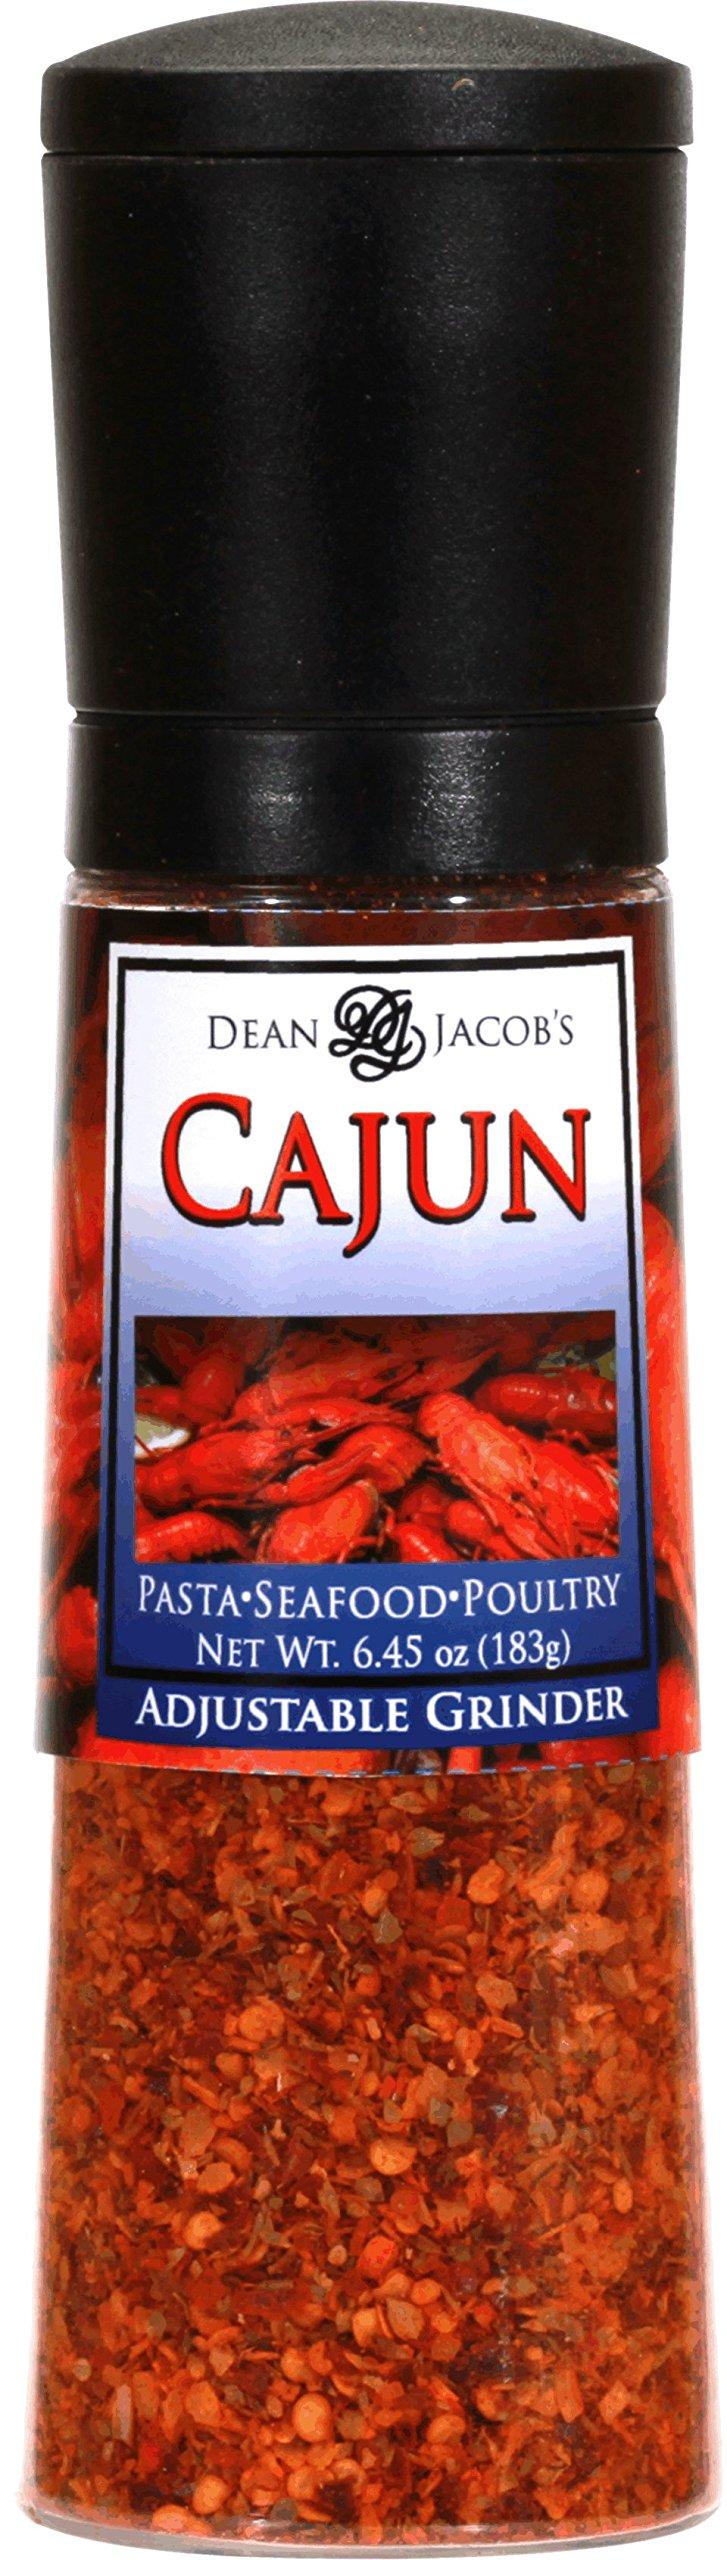 Dean Jacob's Jumbo, Chef Size Grinder - Cajun